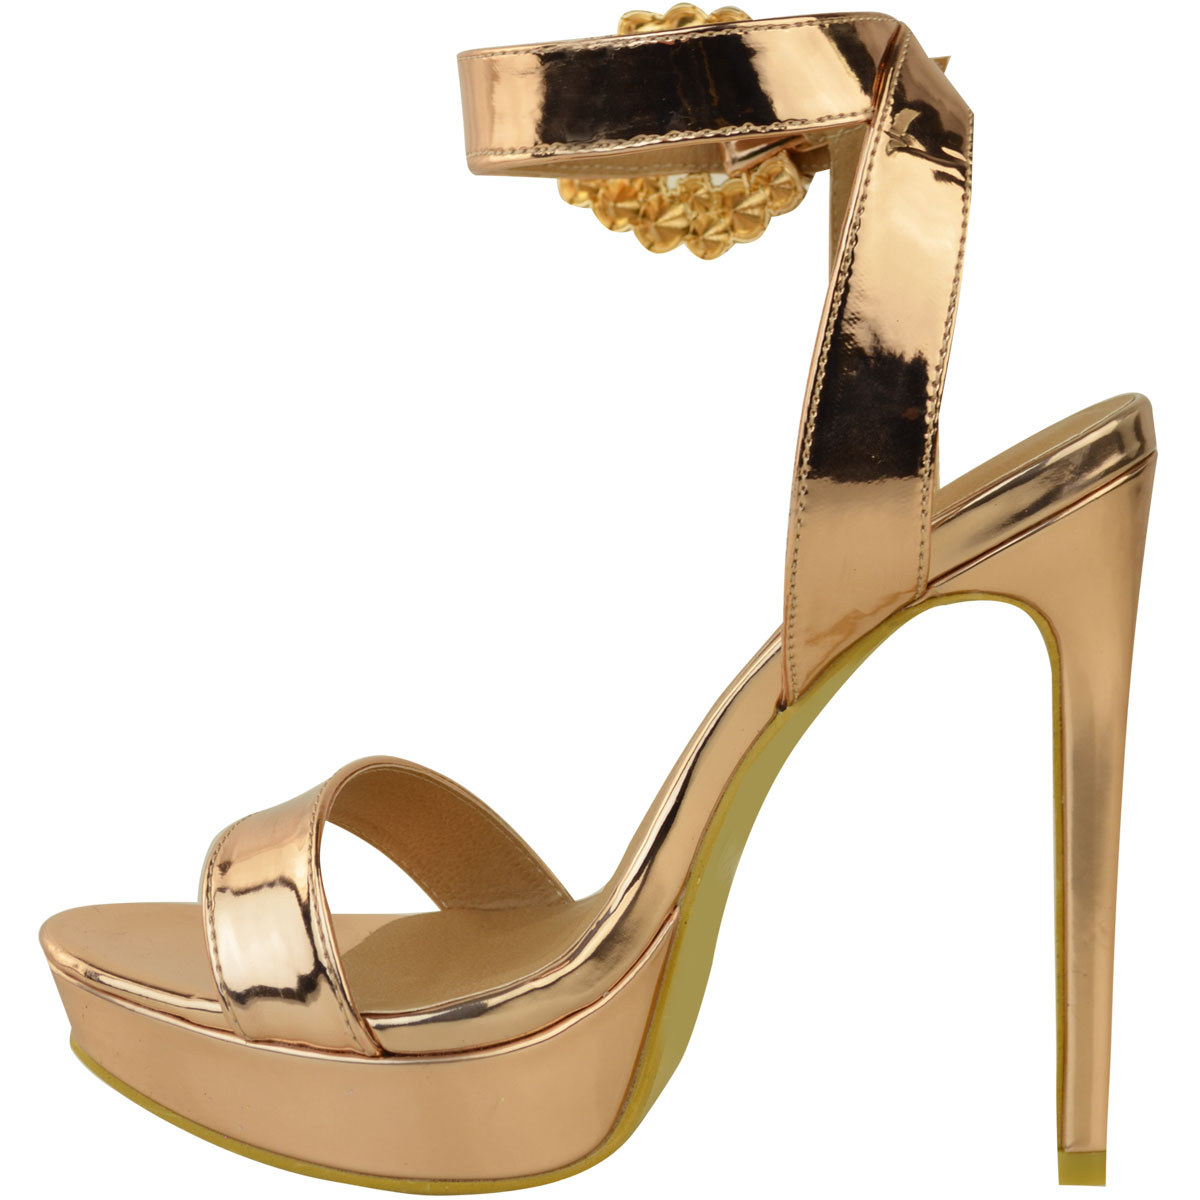 Womens-Ladies-Stilettos-High-Heels-Strappy-Platforms-Sandals-Diamante-Shoes-Size thumbnail 36